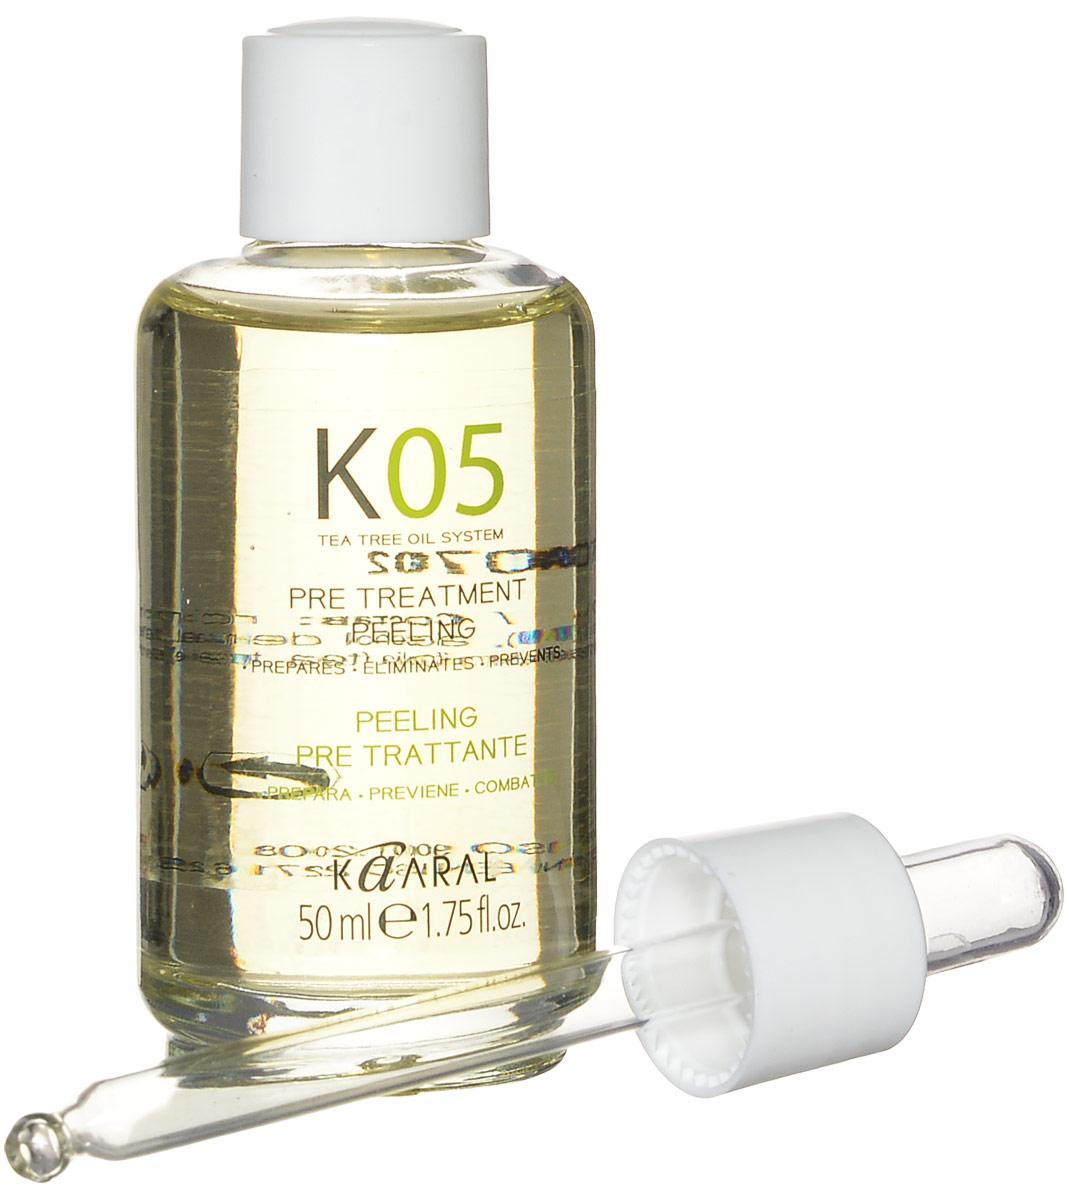 Kaaral Капли для подготовки к процедурам К05 Gocce Pre-Treatment, 50 мл kaaral к05 gocce pre treatment жидкость для волос 50 мл